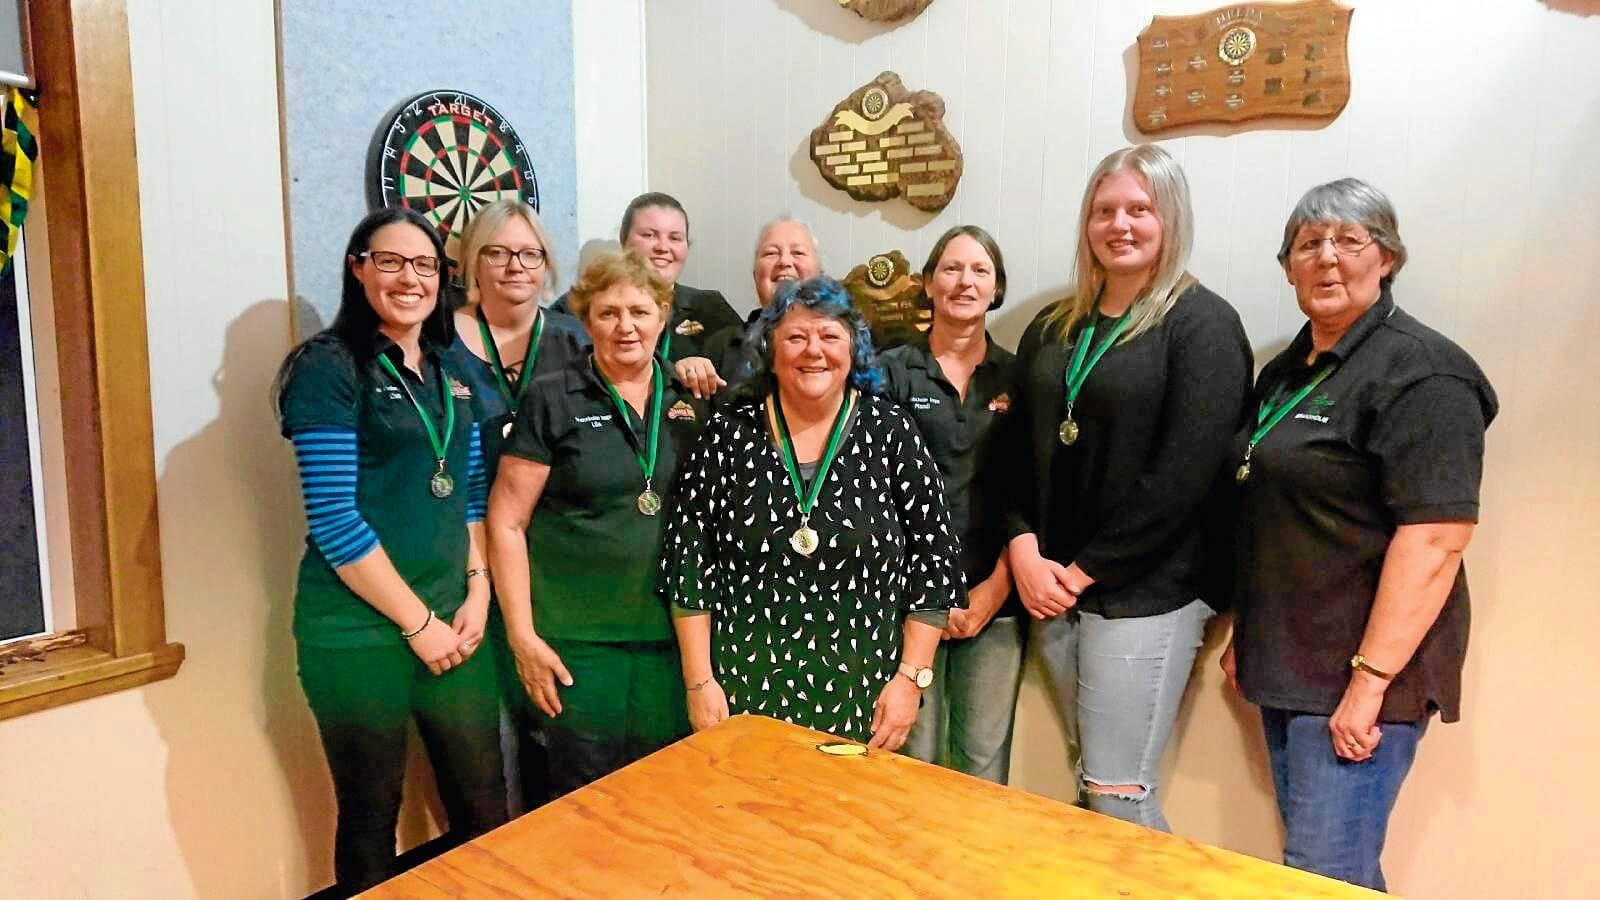 • Winning team Lisa Barrett, Wendy McDougall, Mel Brown, Kelly Lade, Mandi Edwards, Rhiannon Shannon-Grant, Alison Barrett (back). Lila Bailey and Trish Reeve (front).